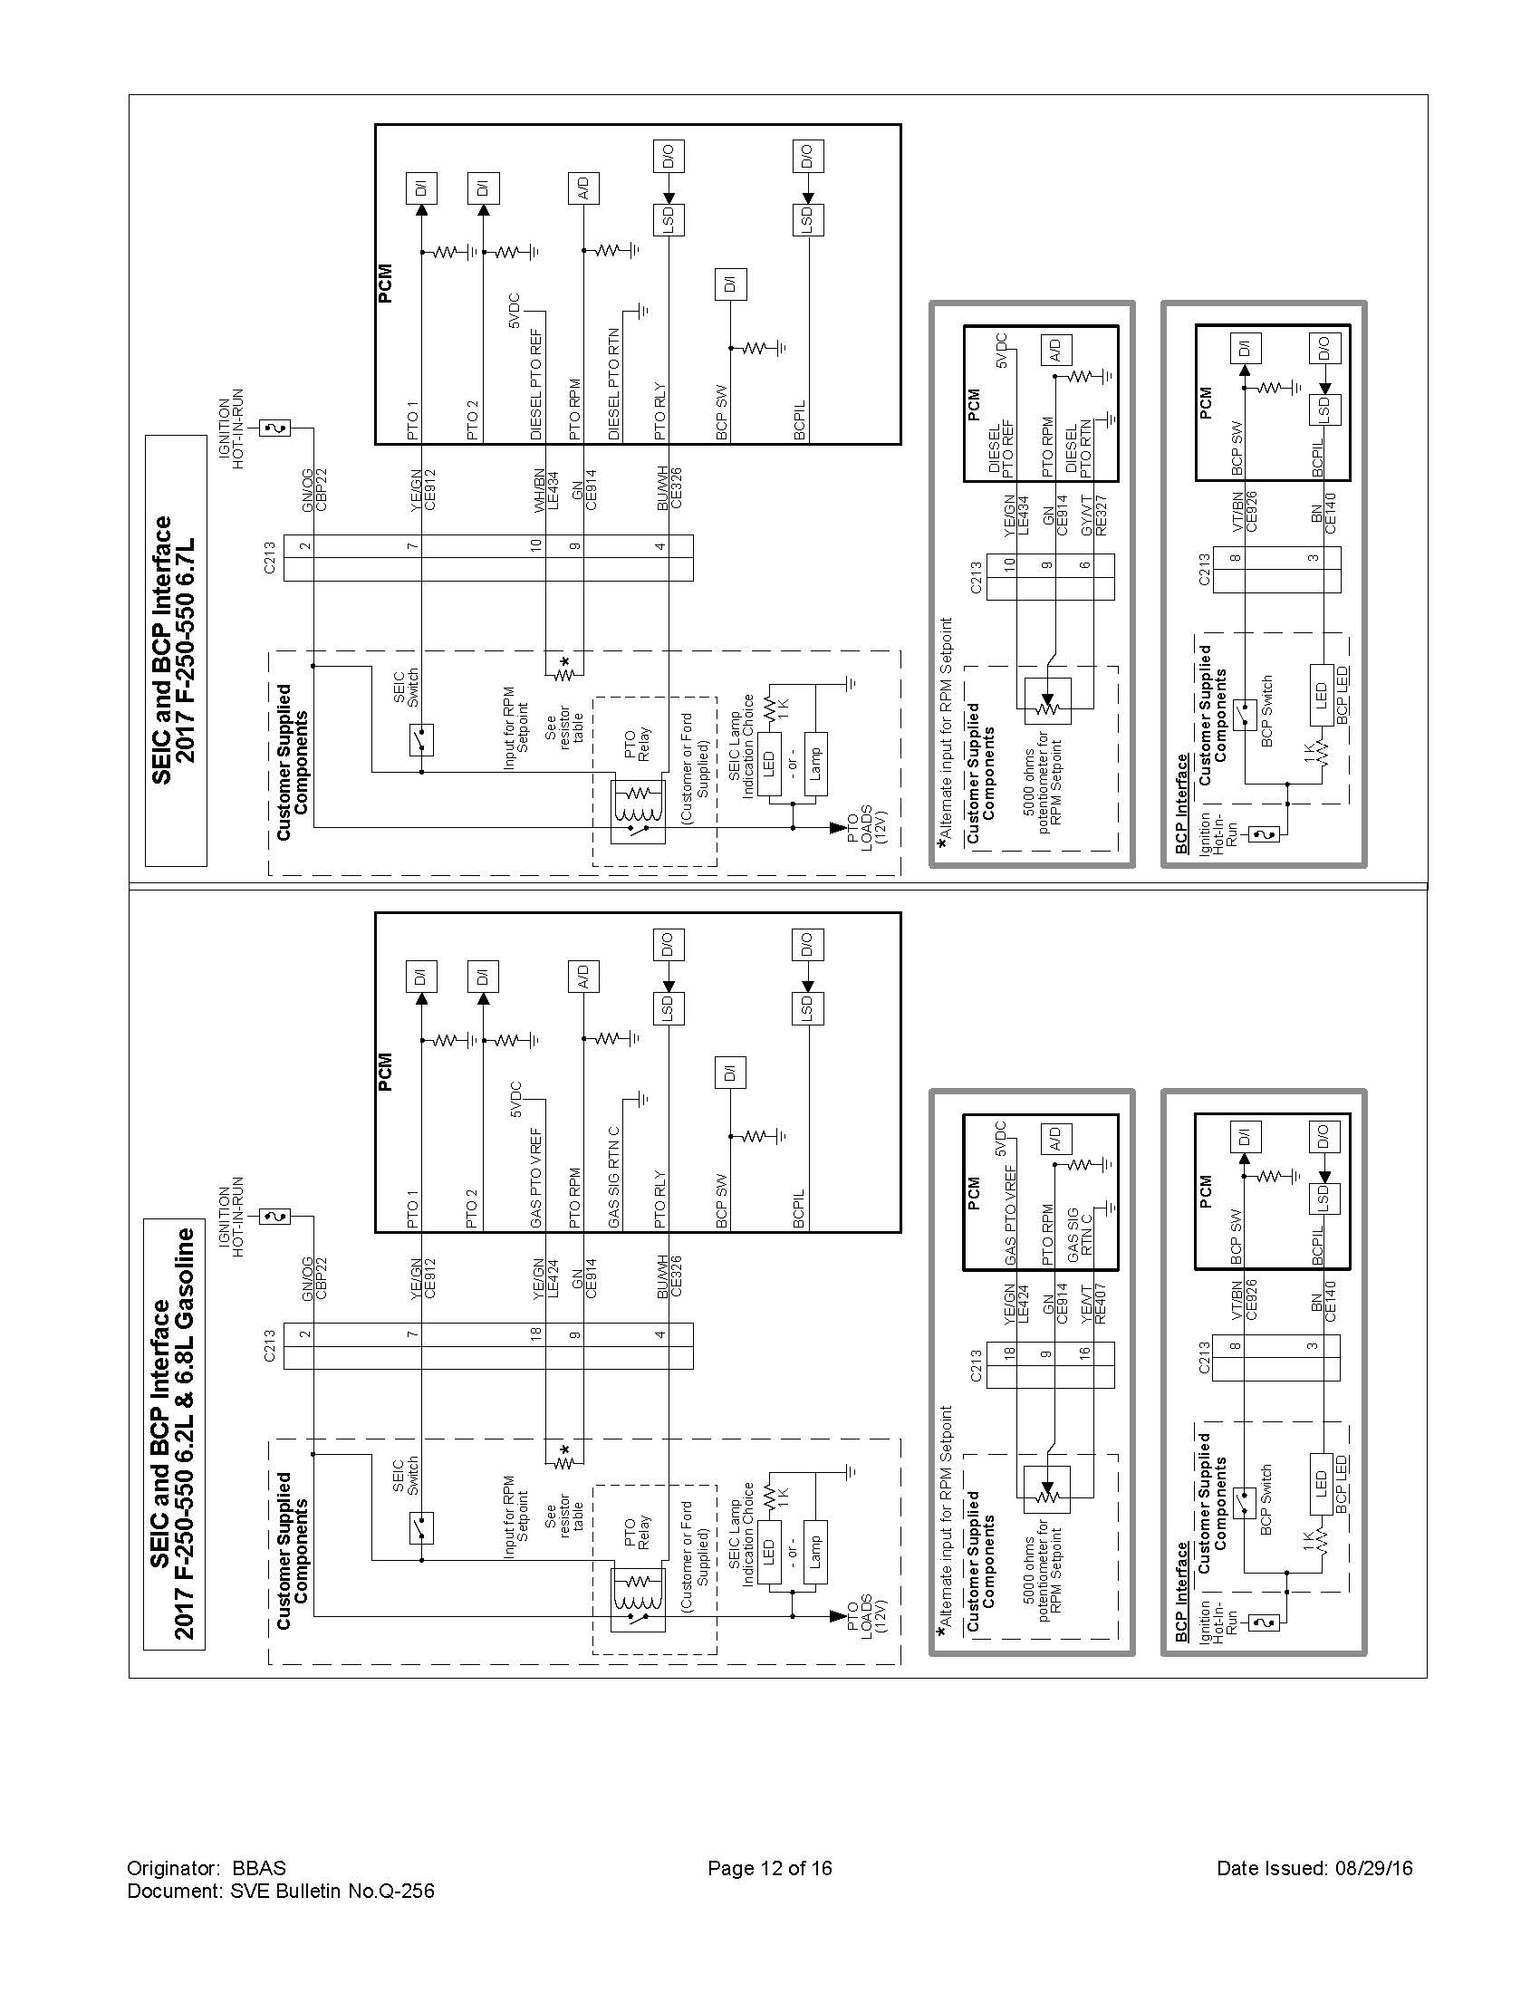 80 q_256_2017_6_2_6_7_6_8_high_idle_info_page_12_ca4c5b7d65290d409642826bab1ed1617f67b84a?resize=665%2C861&ssl=1 2005 ford f550 pto wiring diagram ford 6 0 diesel diagram, 2005 2000 ford f550 pto wiring diagram at bakdesigns.co